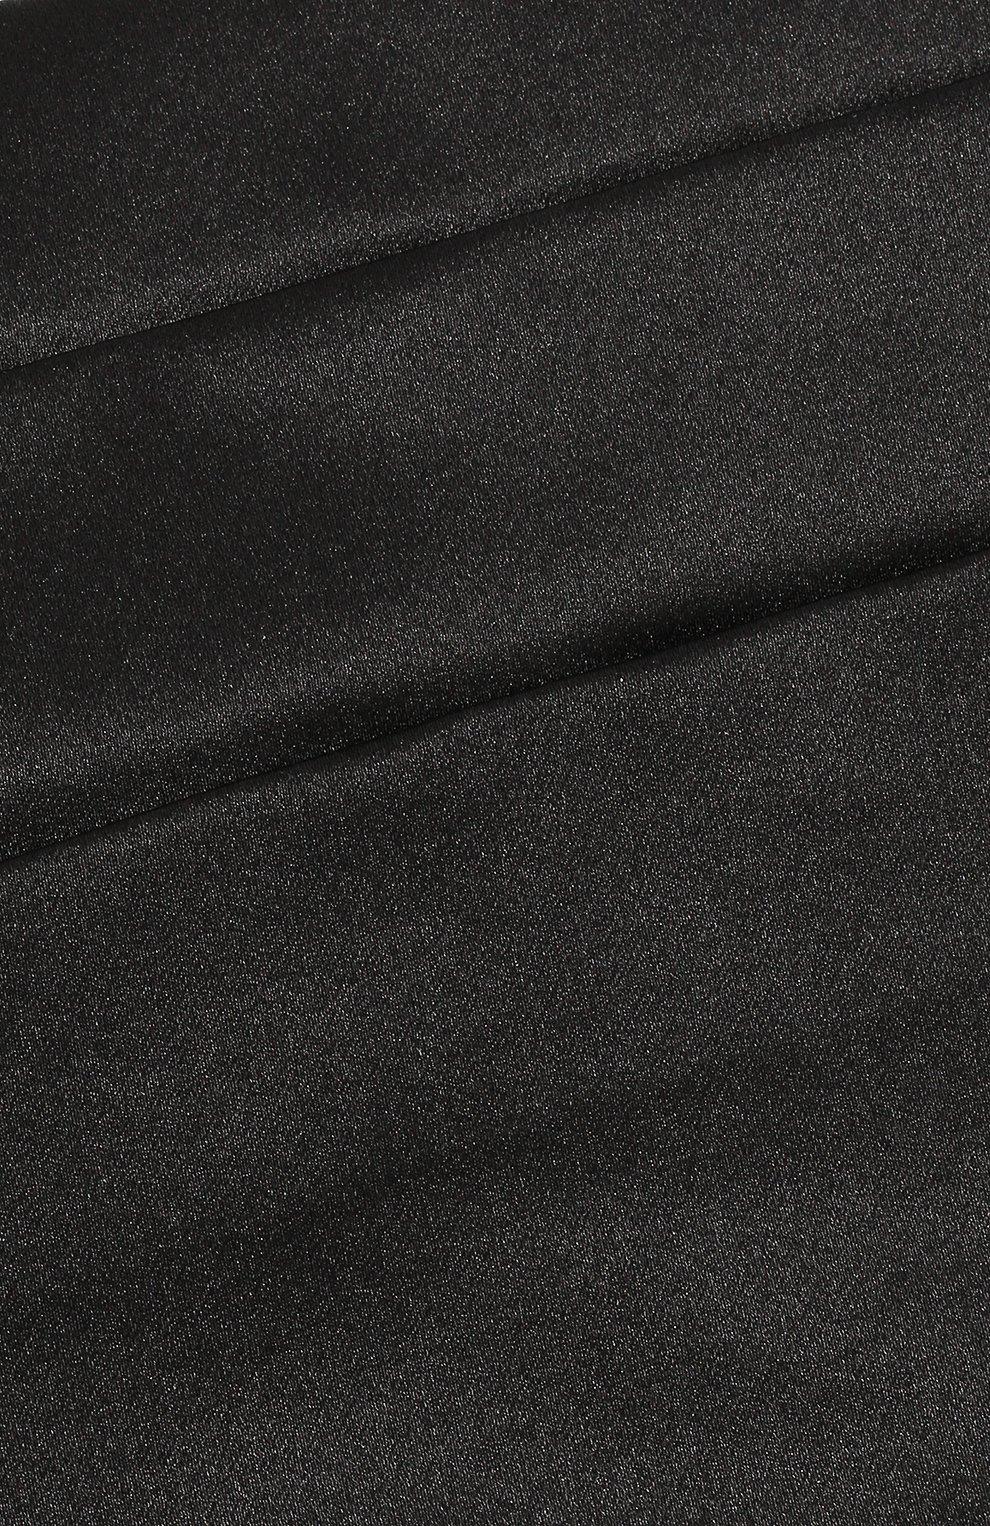 Мужской камербанд из хлопка и шелка BRUNELLO CUCINELLI темно-синего цвета, арт. MR813S005 | Фото 4